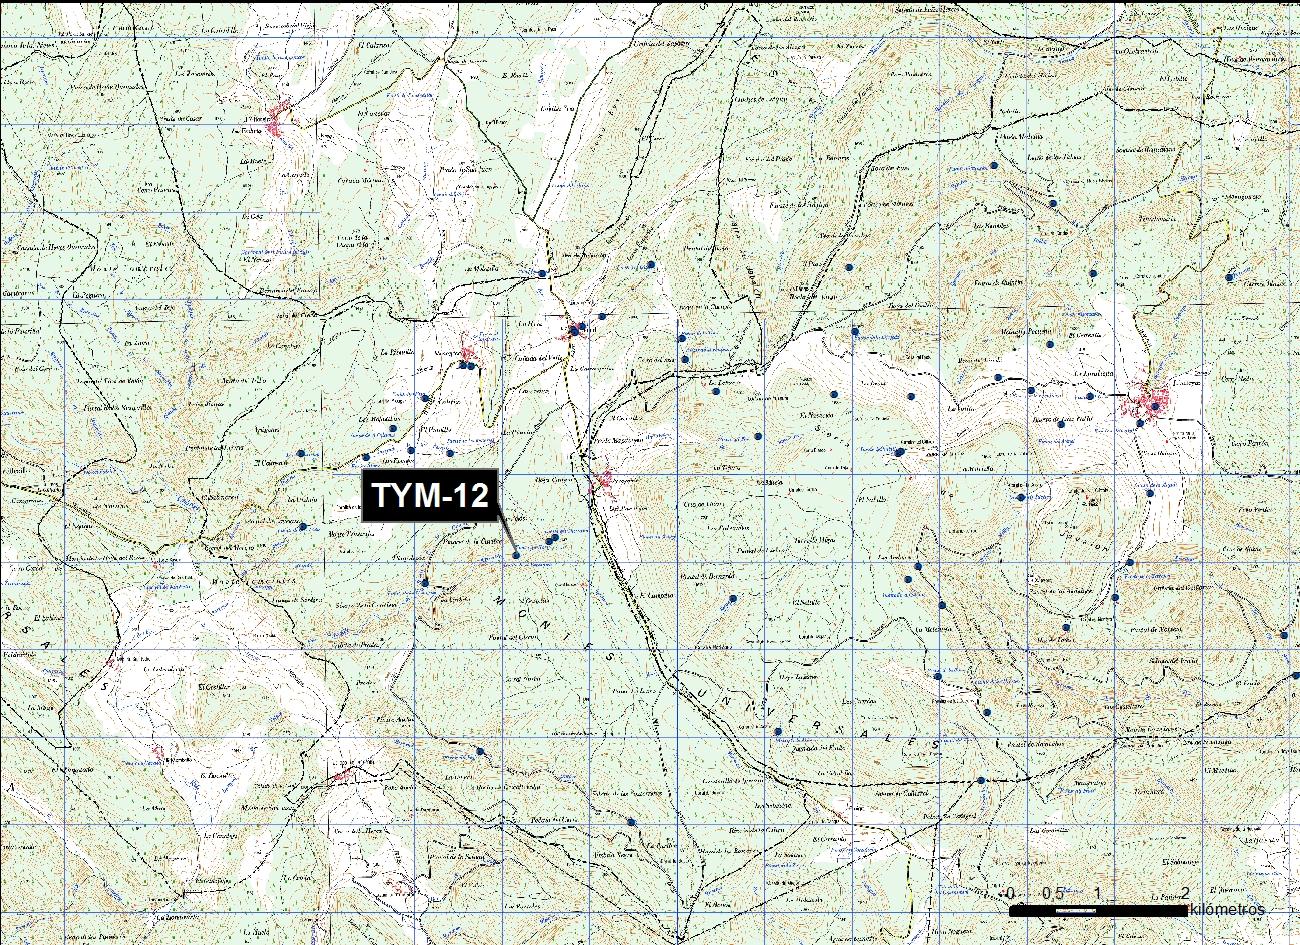 TYM_12_M.V.LOZANO_CARBONERA_MAP.TOPO 1